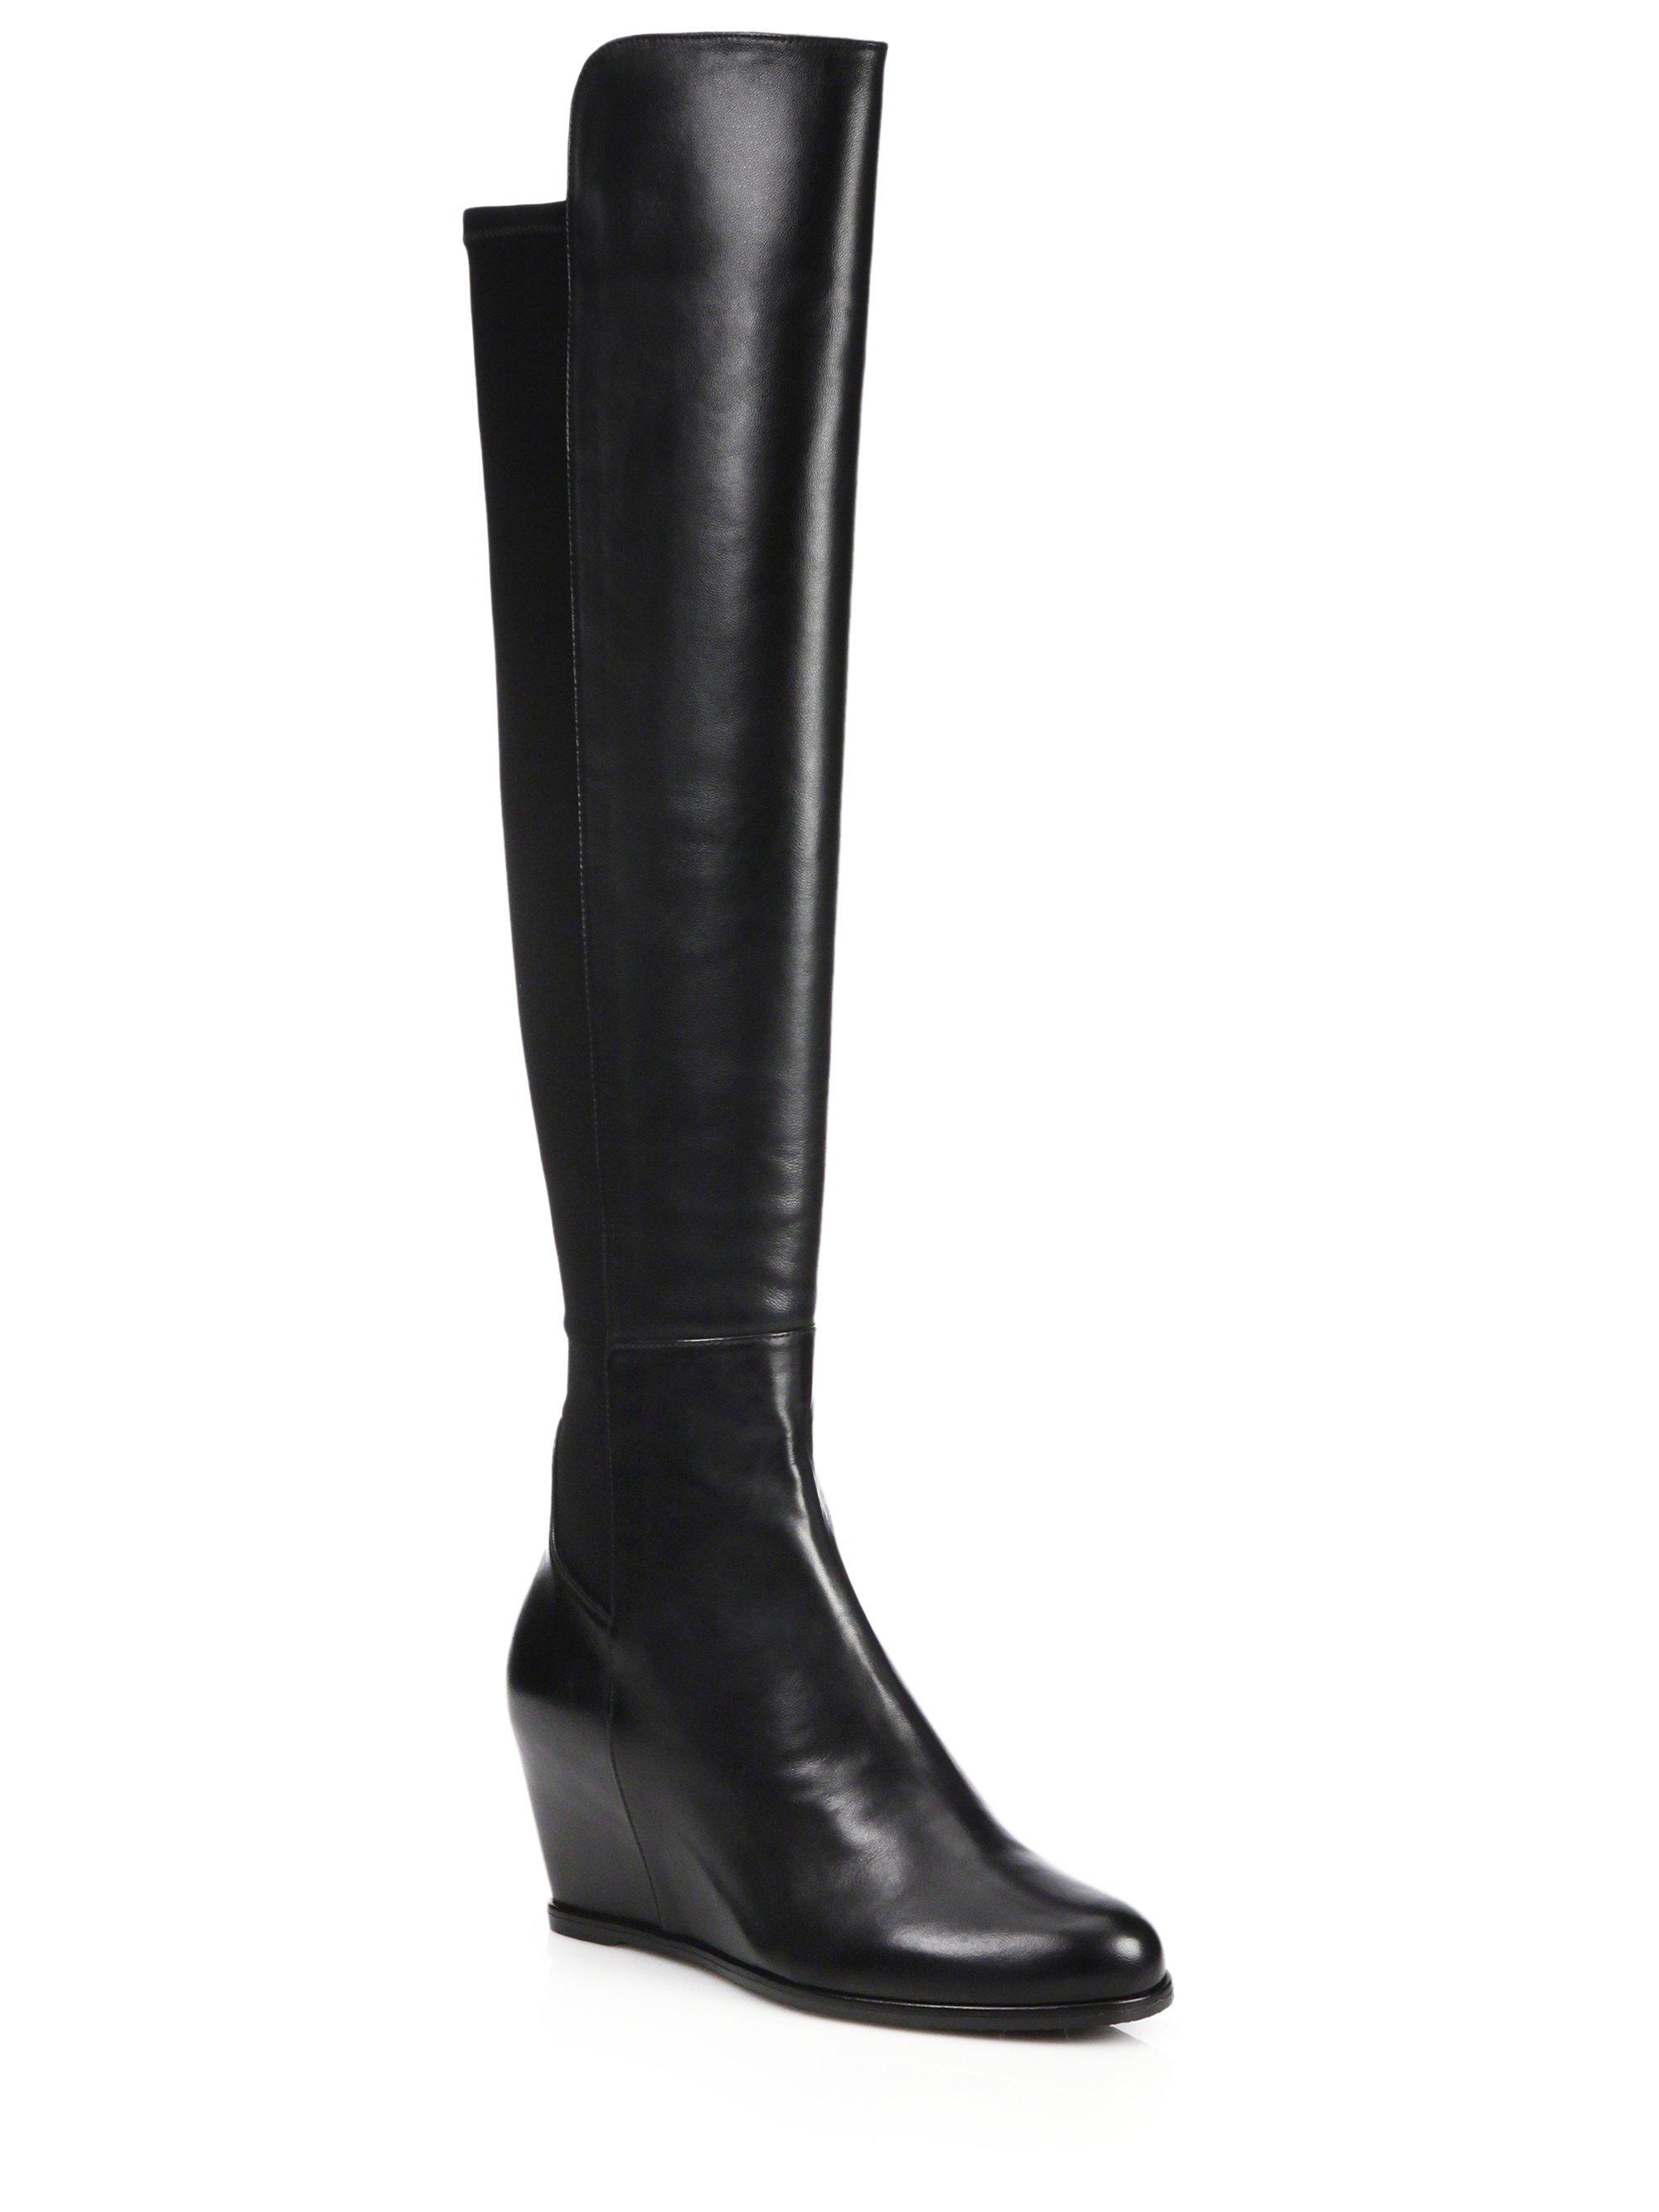 stuart weitzman semi leather suede the knee wedge